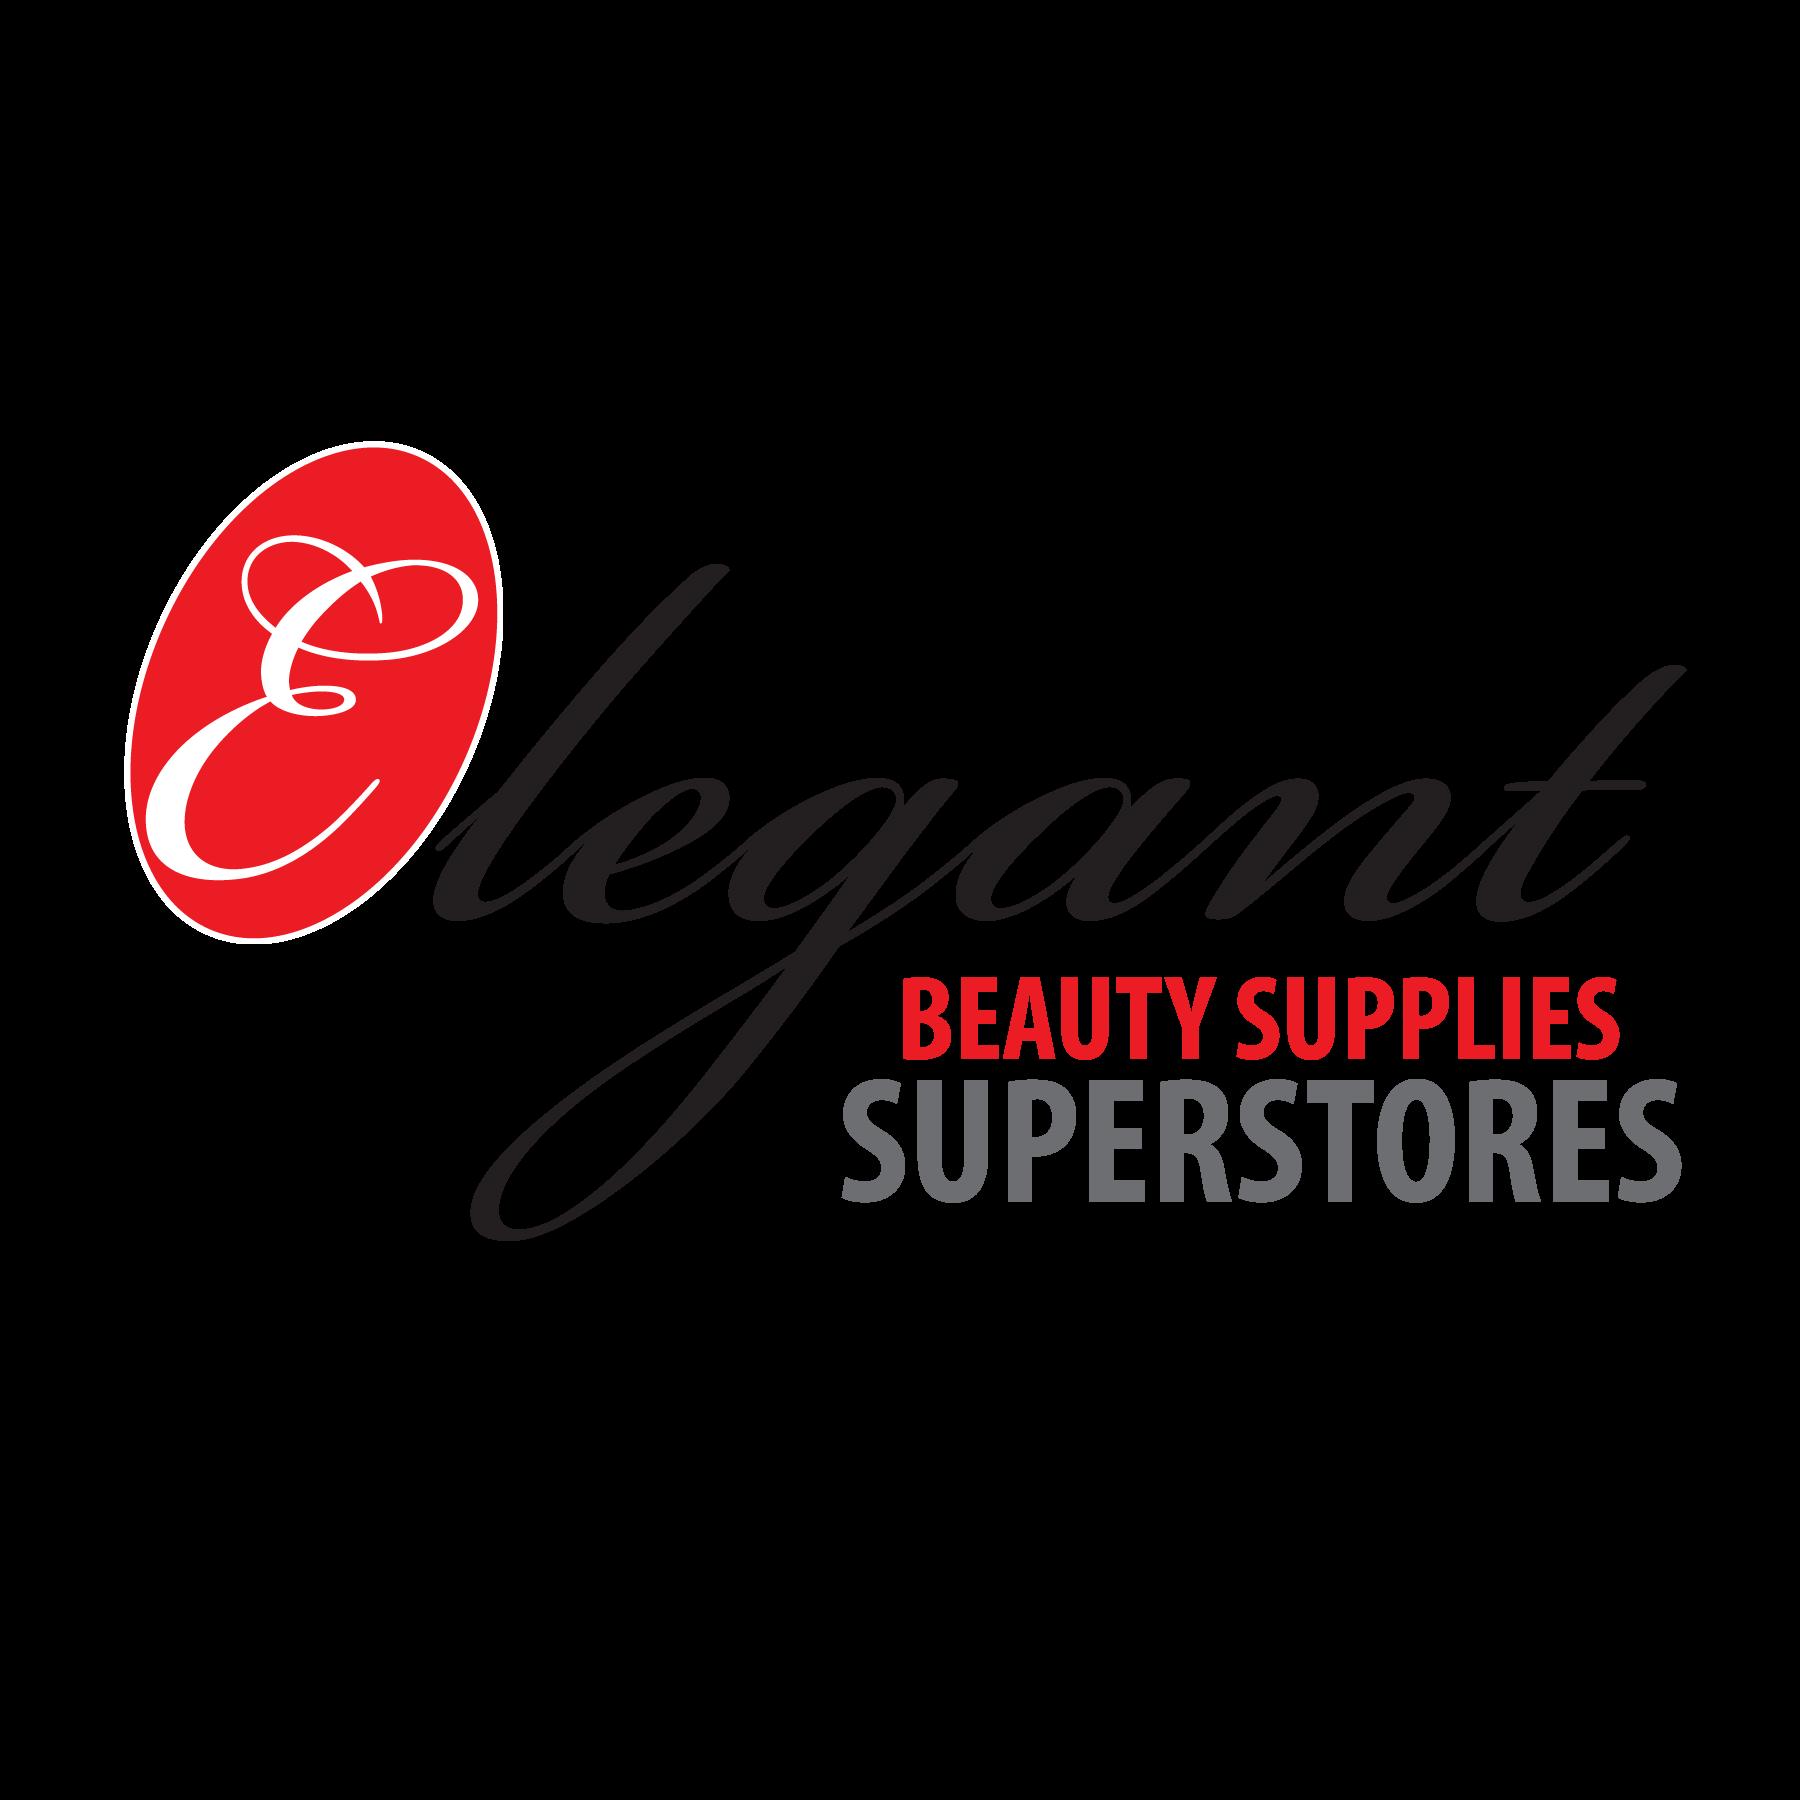 Elegant Beauty Supplies Superstores